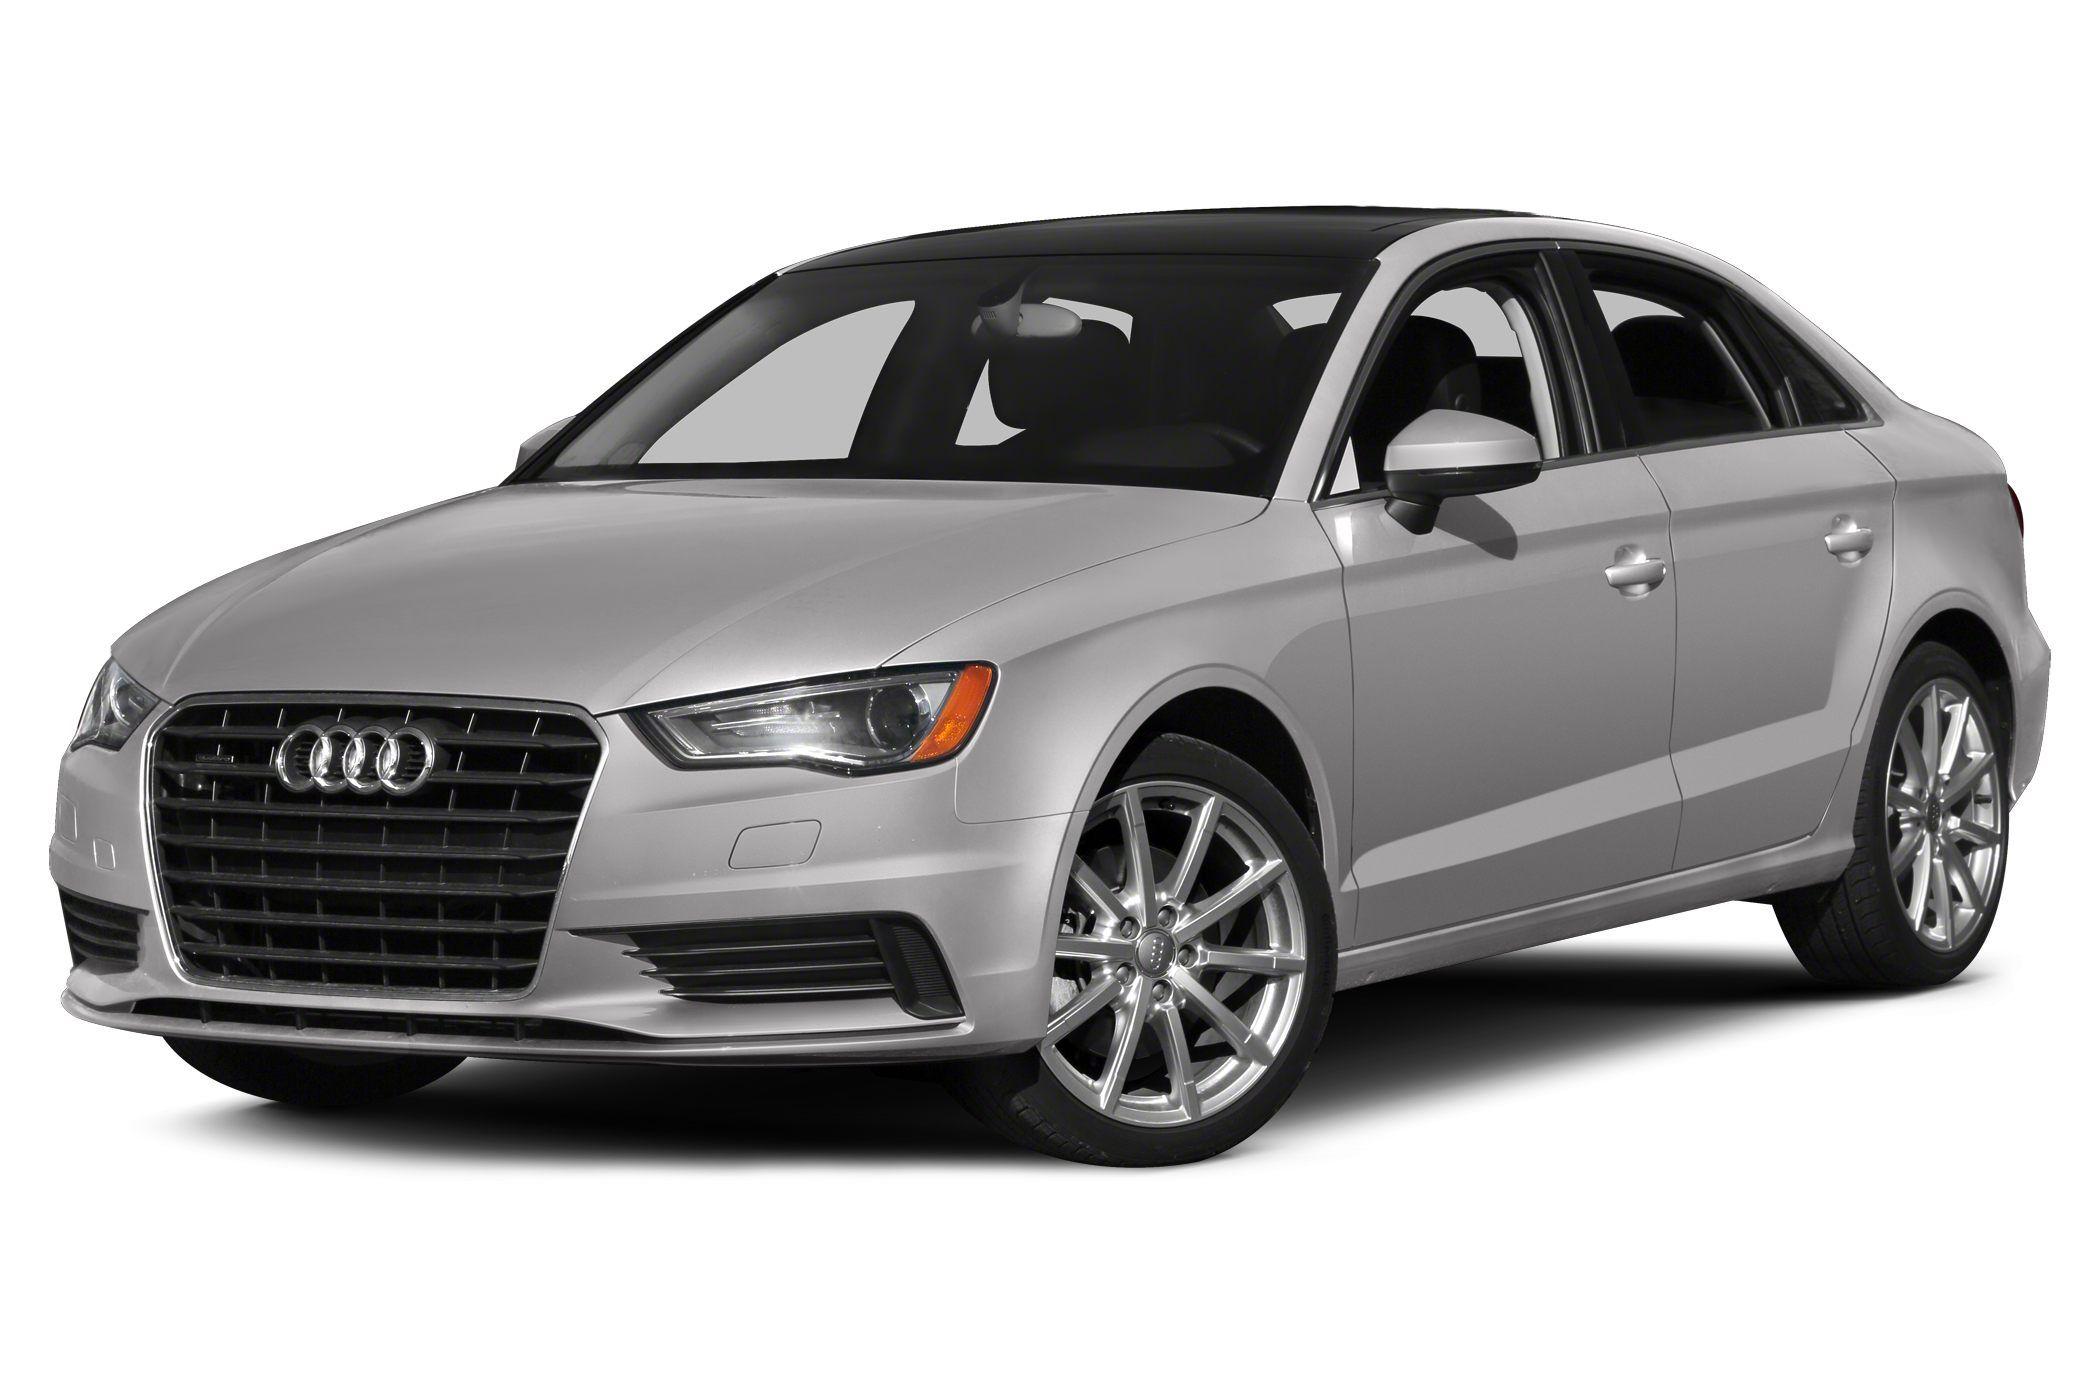 Engine Prices | New audi car, Audi, Audi a3